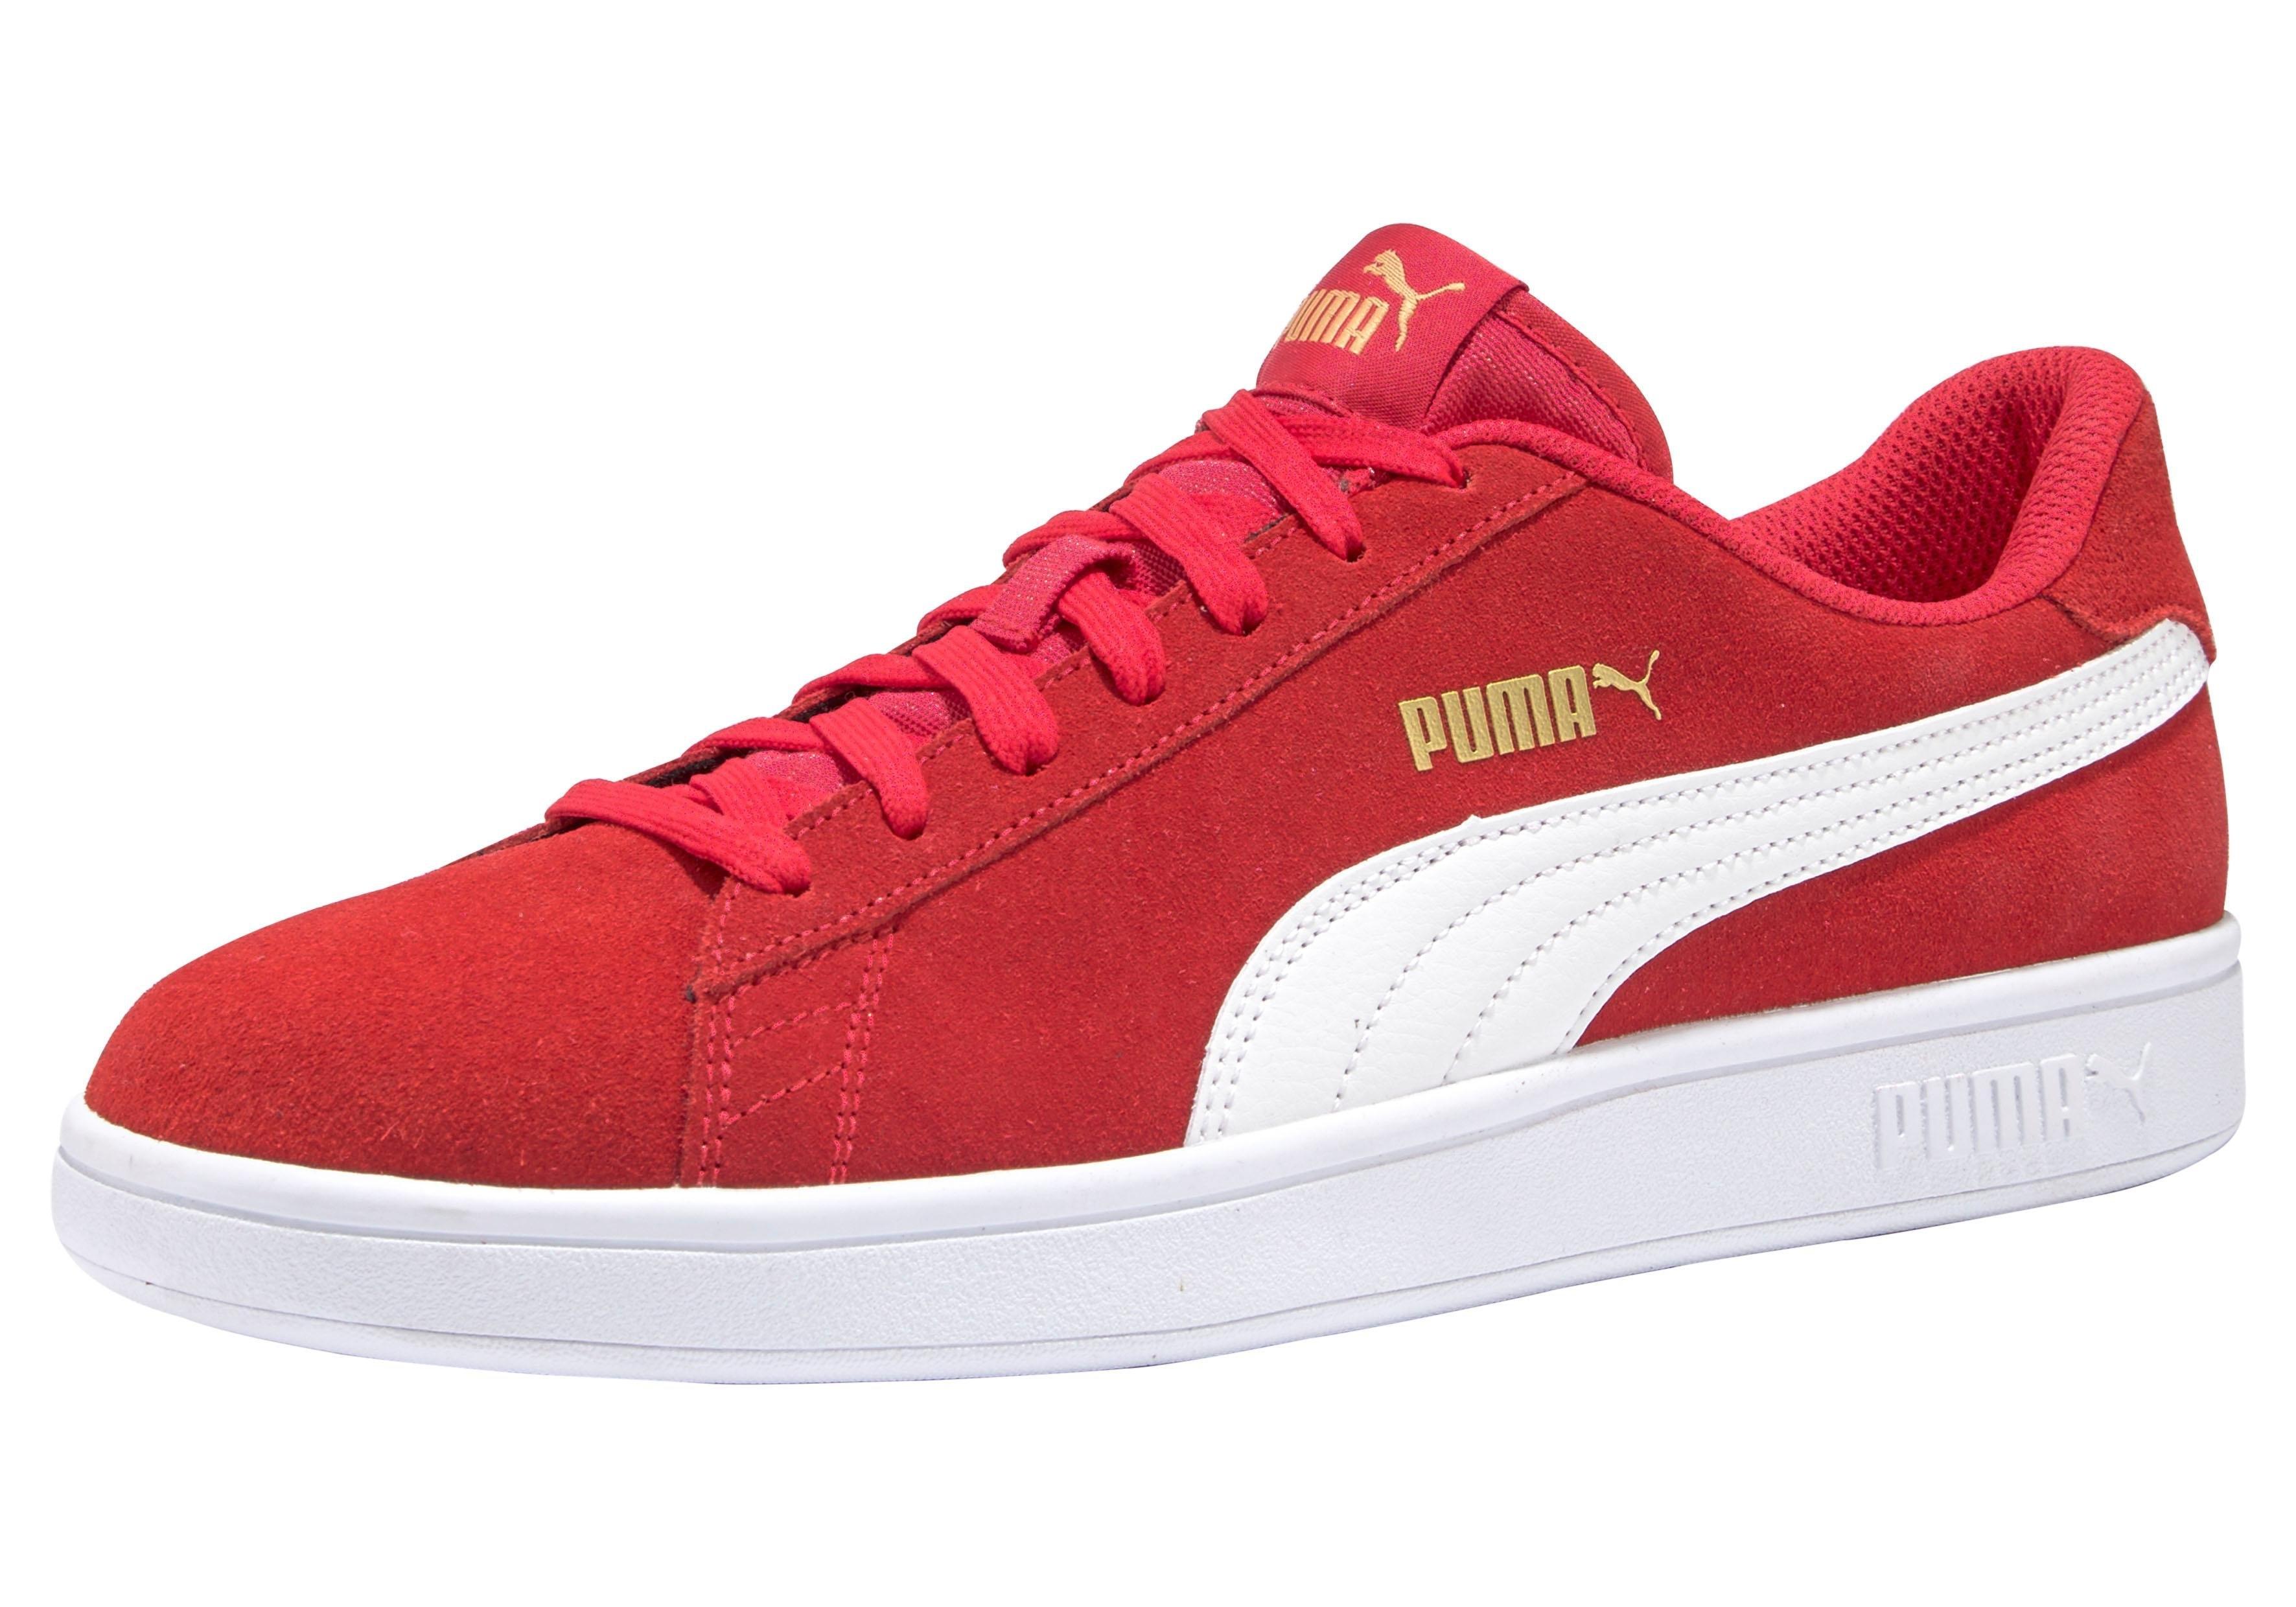 476bdd98aa3 ... PUMA sneakers »Puma Vikky Stacked SD«, PUMA Sneakers Suede Classic+,  PUMA sneakers »Basket Heart Bio Hacking«, PUMA sneakers »Smash v2 L U«, ...